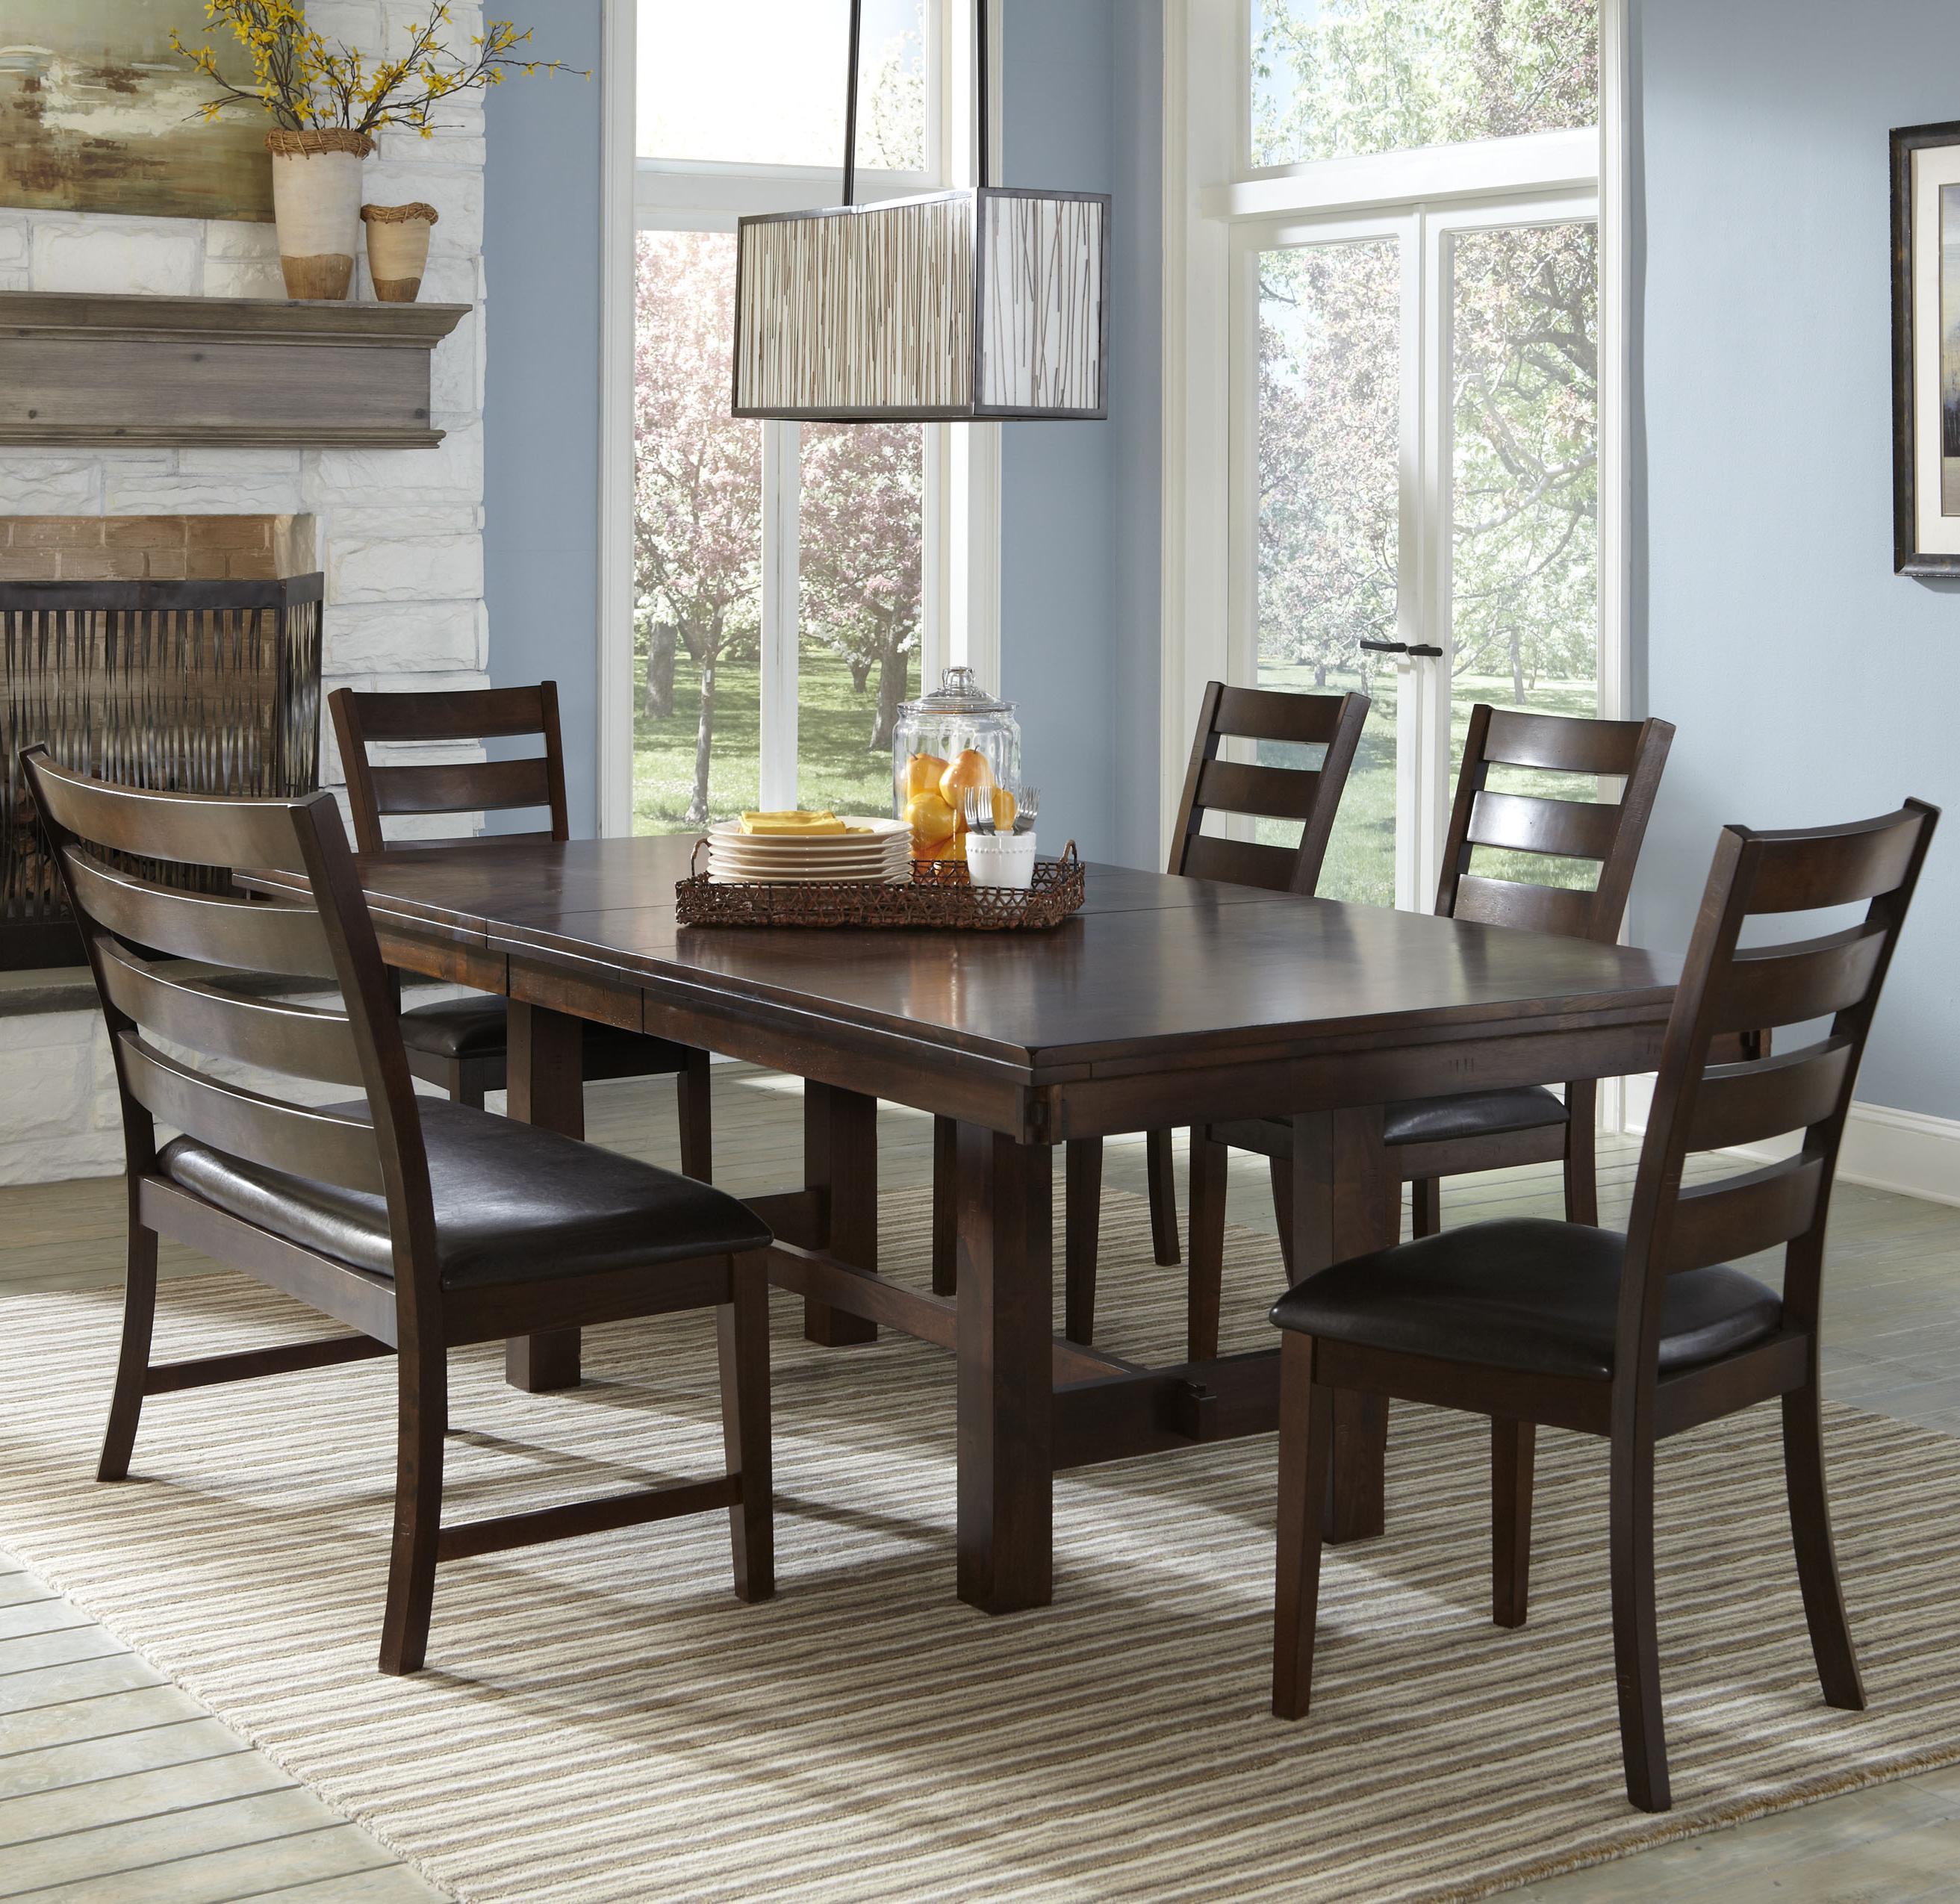 Intercon Kona Dining Set with Bench - Item Number: KA-TA-4492-RAI+4xCH-669L+CH-669LB